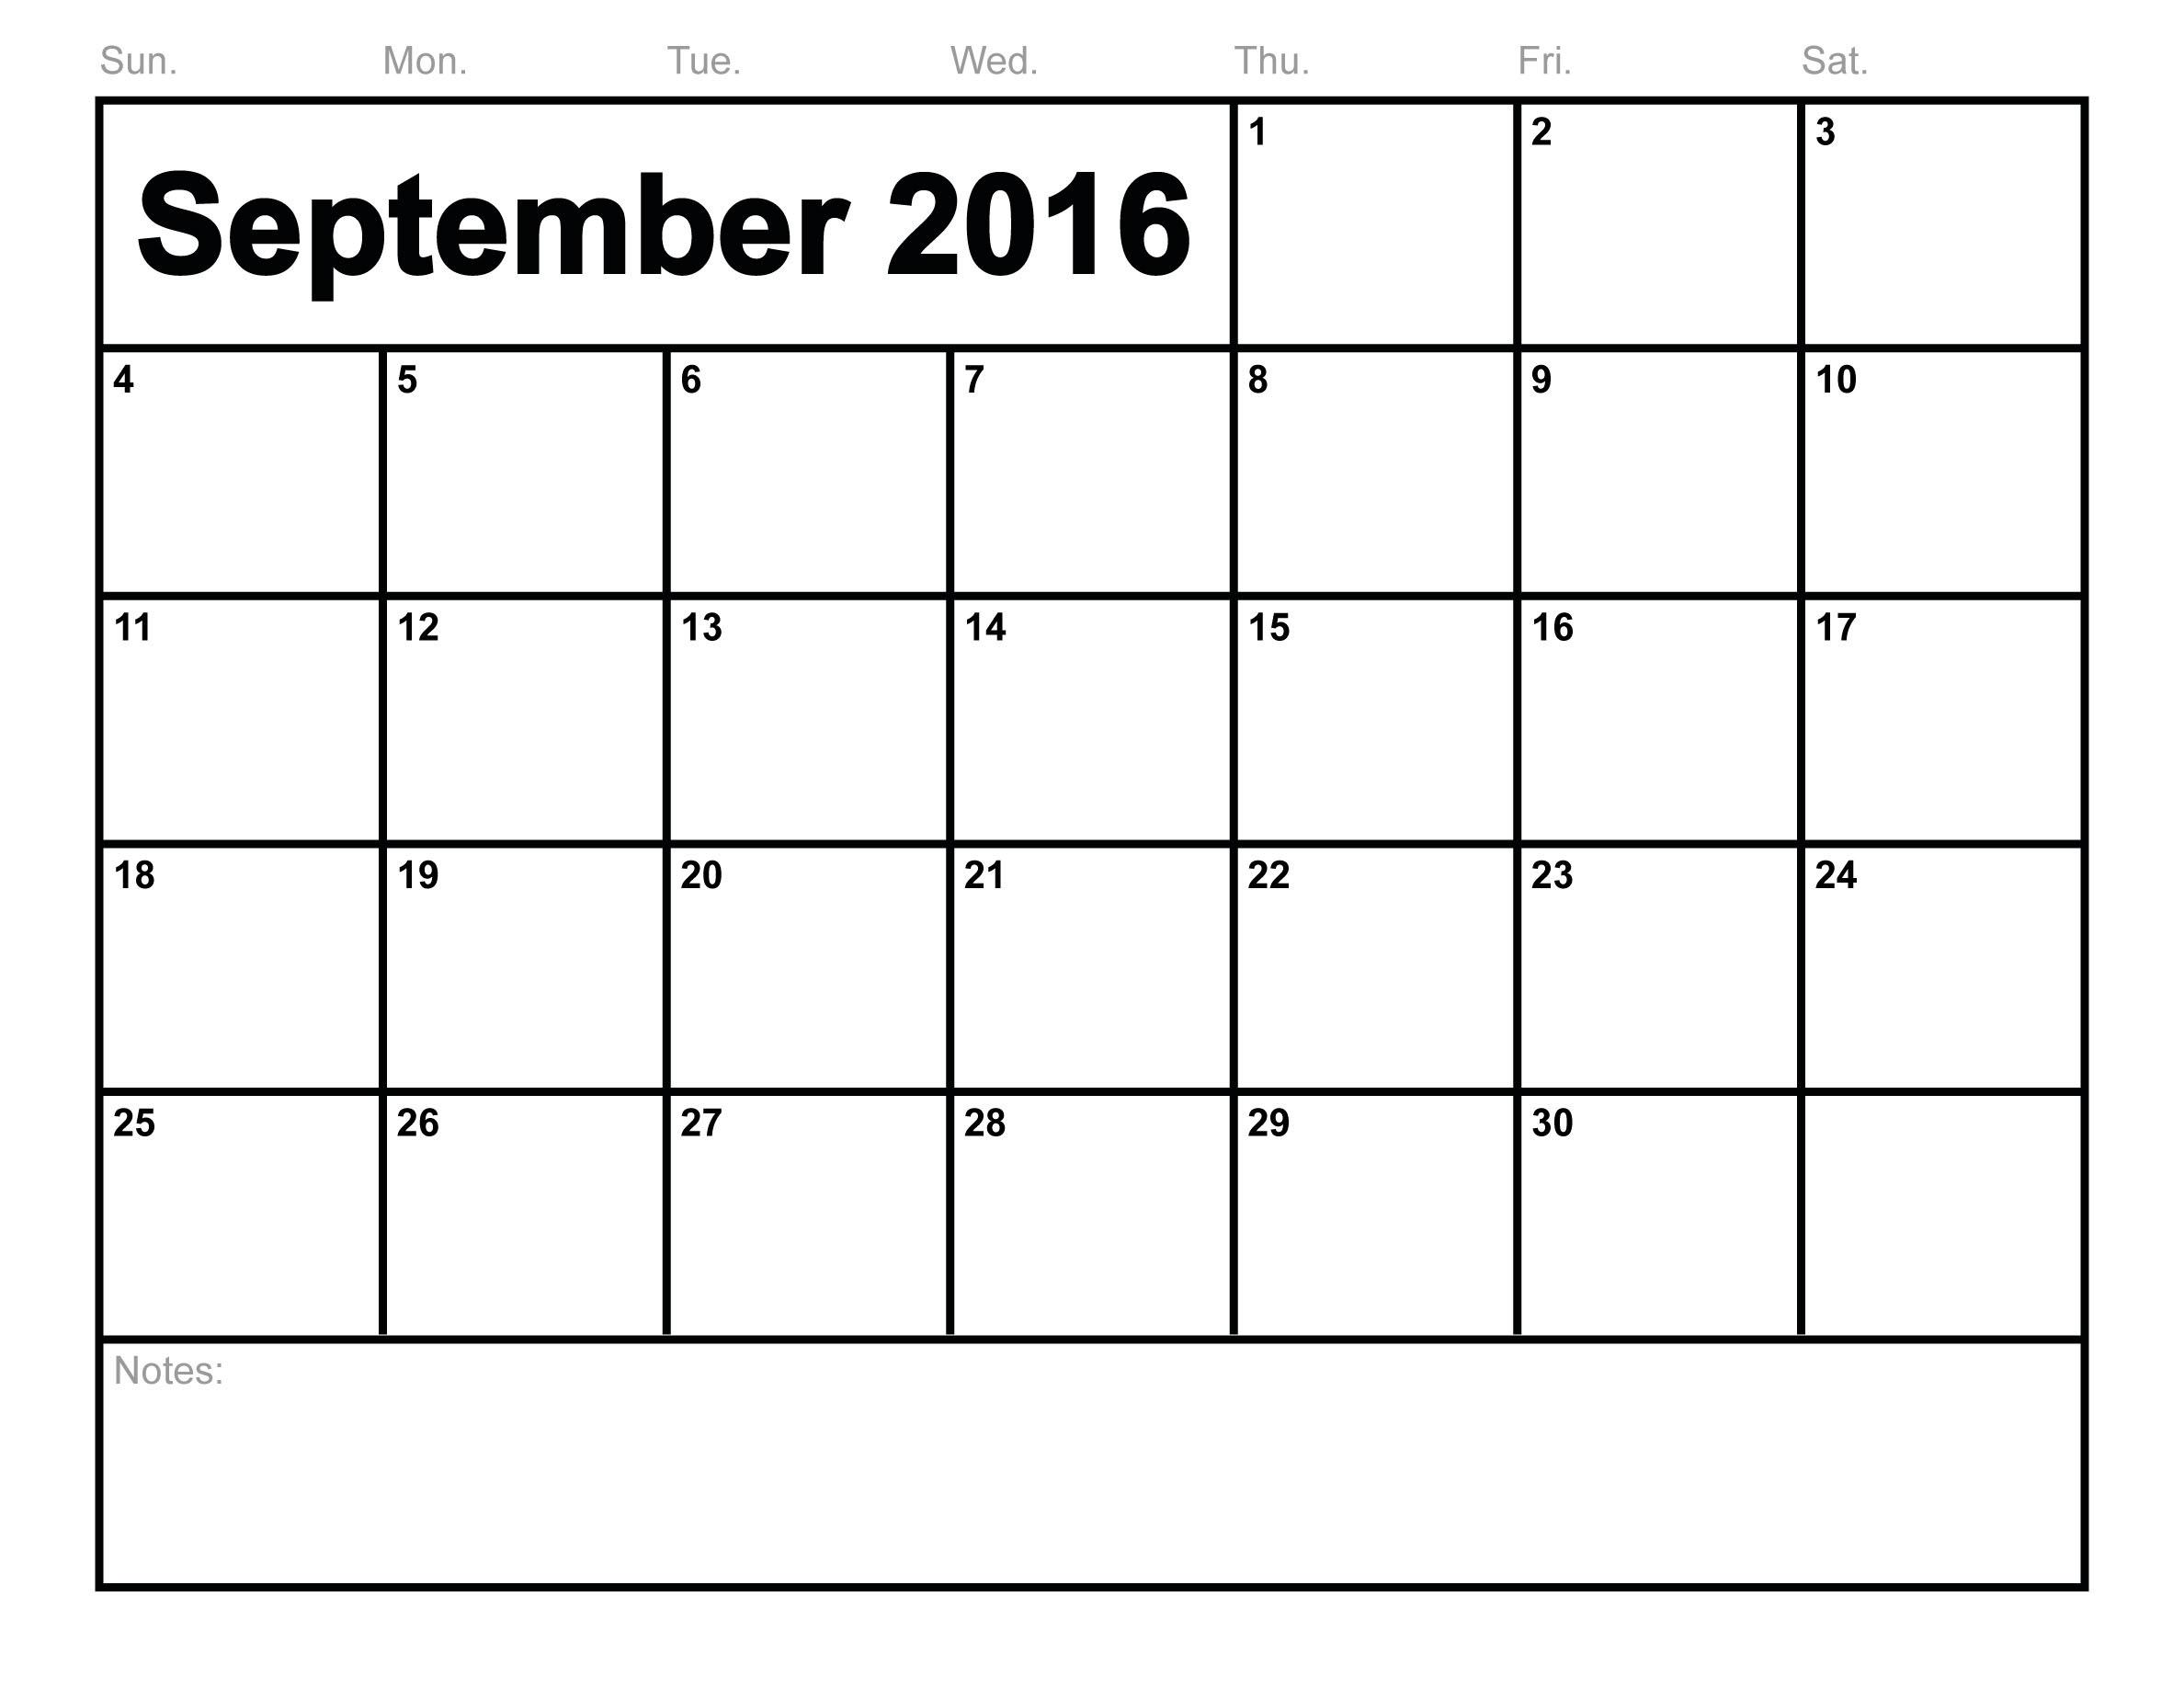 2018 September Printable Calendar Free, Blank Templates Pdf inside December Printable Monthly Calendar Templates